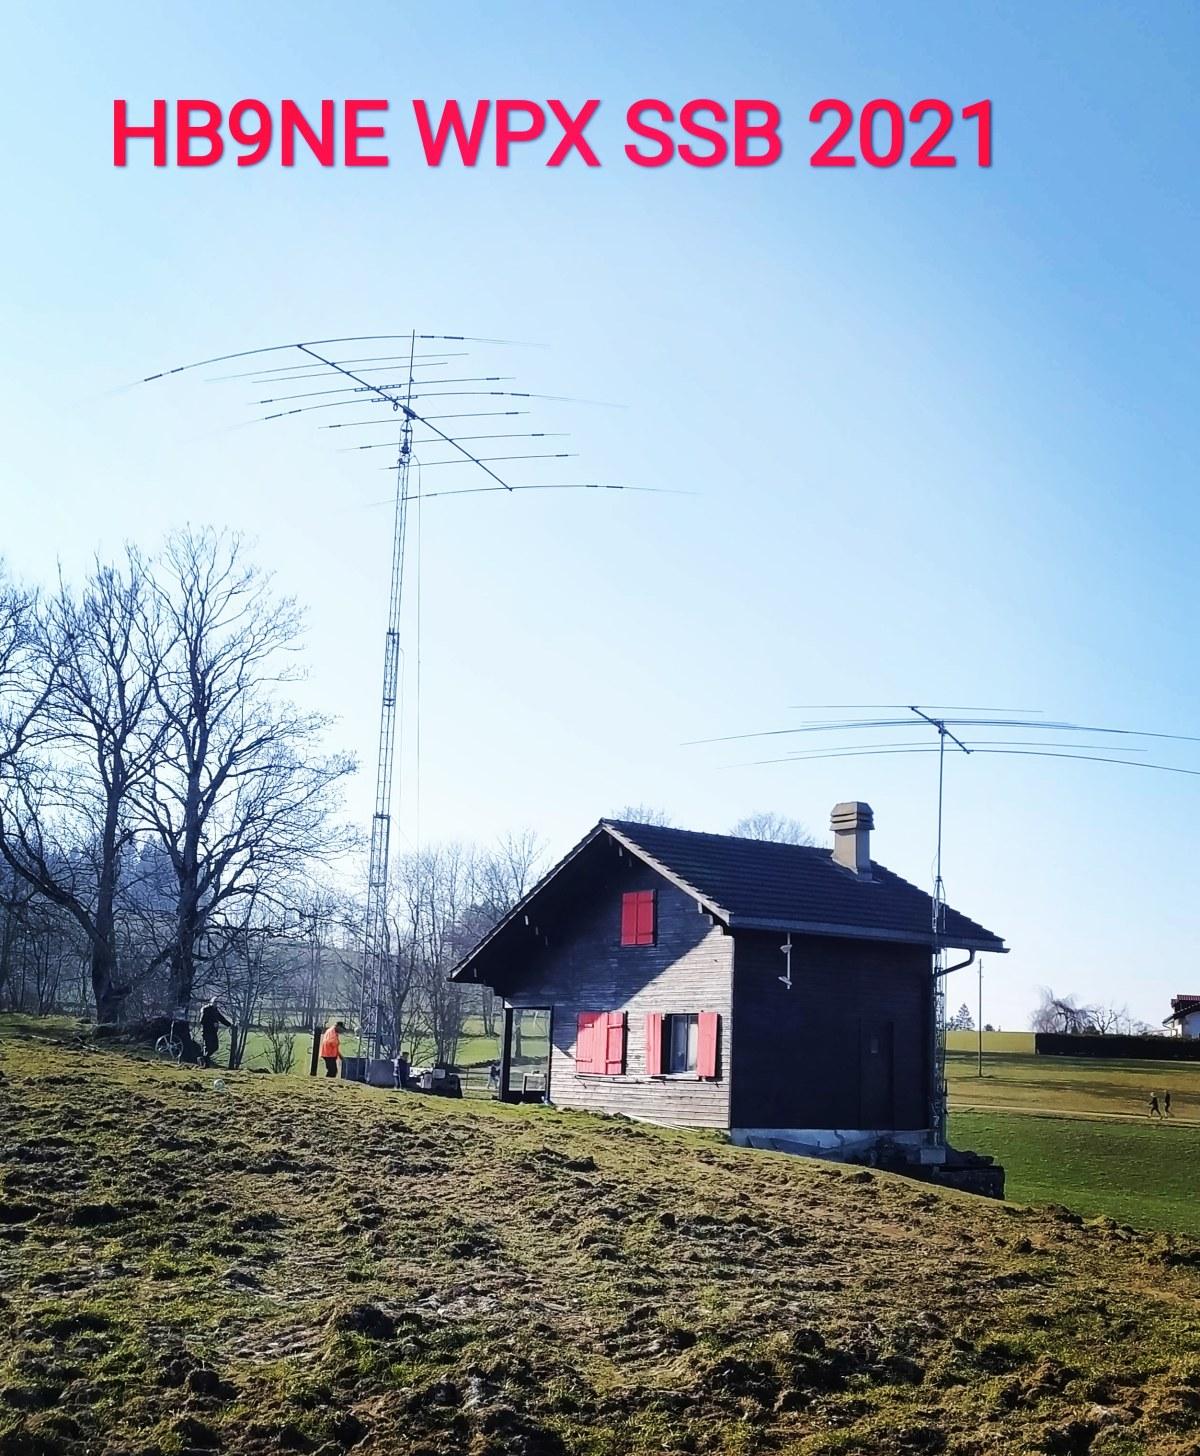 2021 CQ WPX SSBcontest